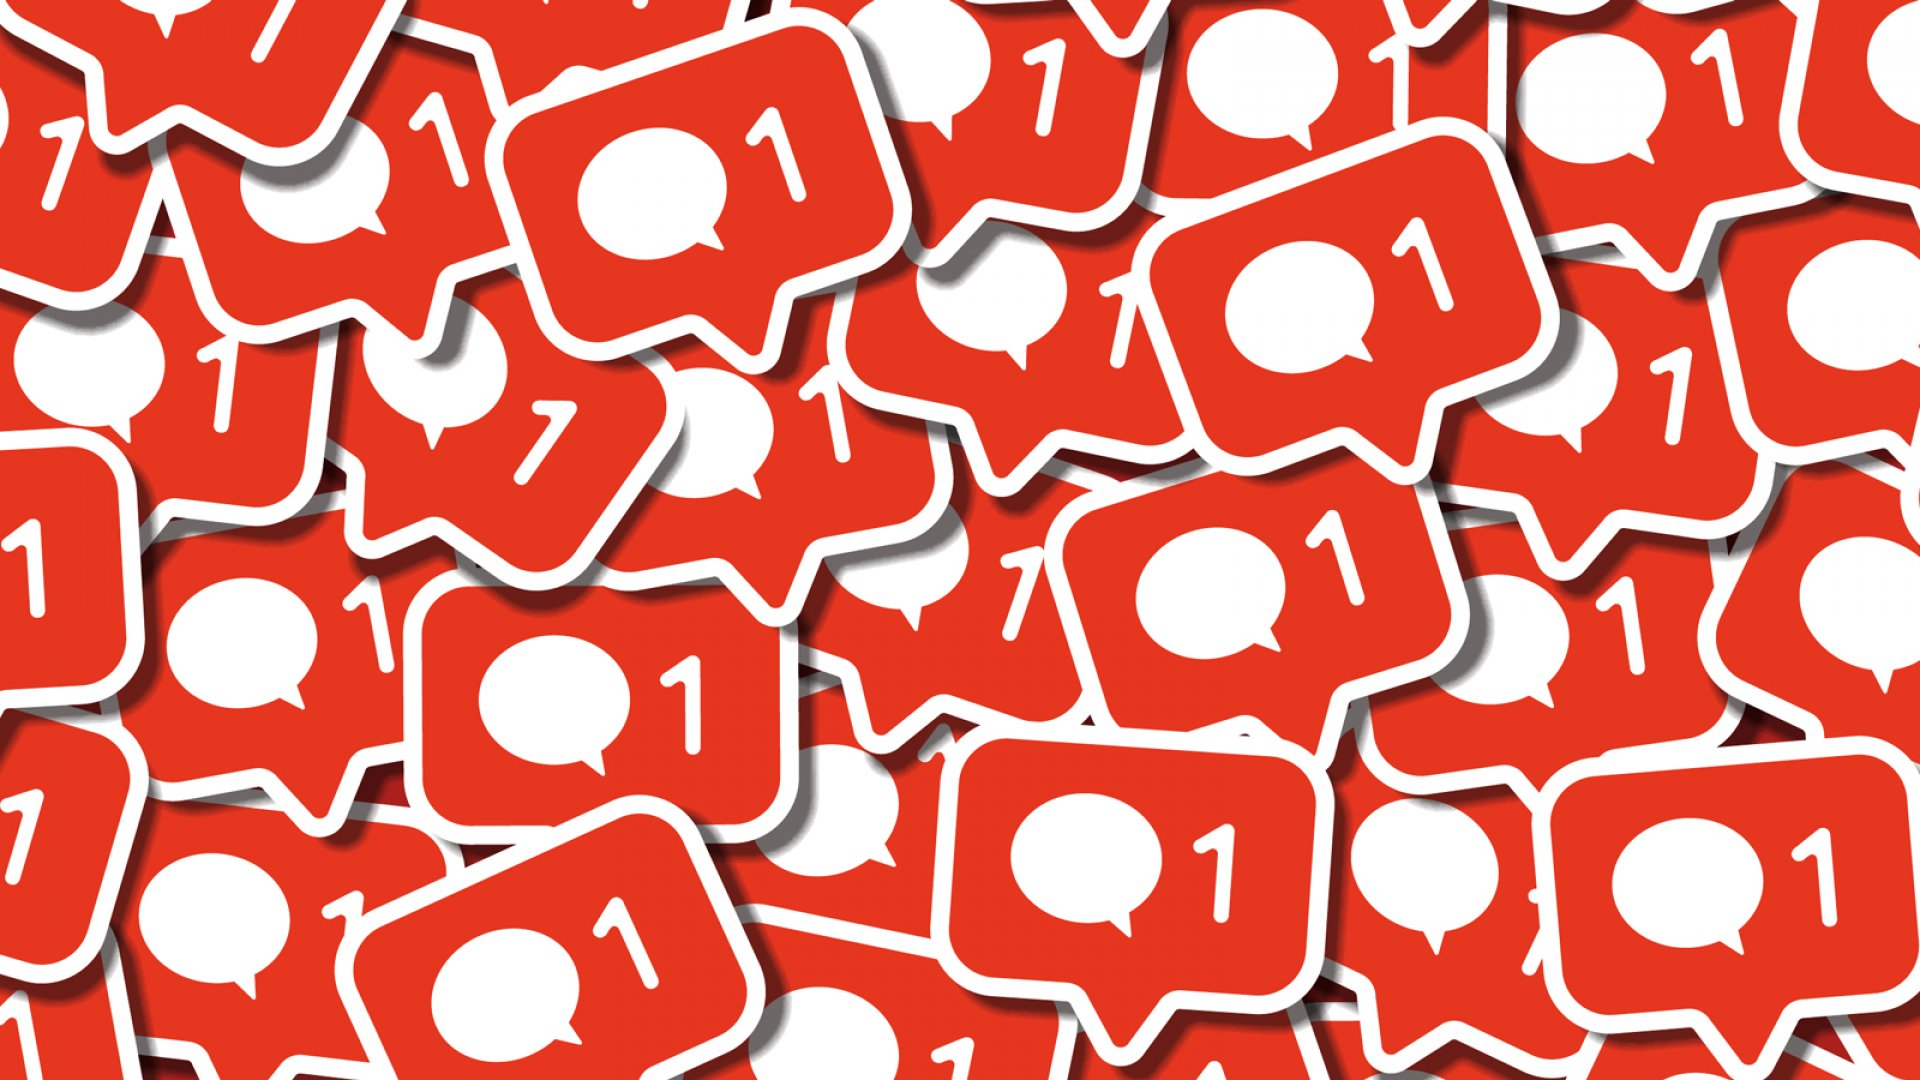 Social Media Fiasco? This Startup's Got You Covered